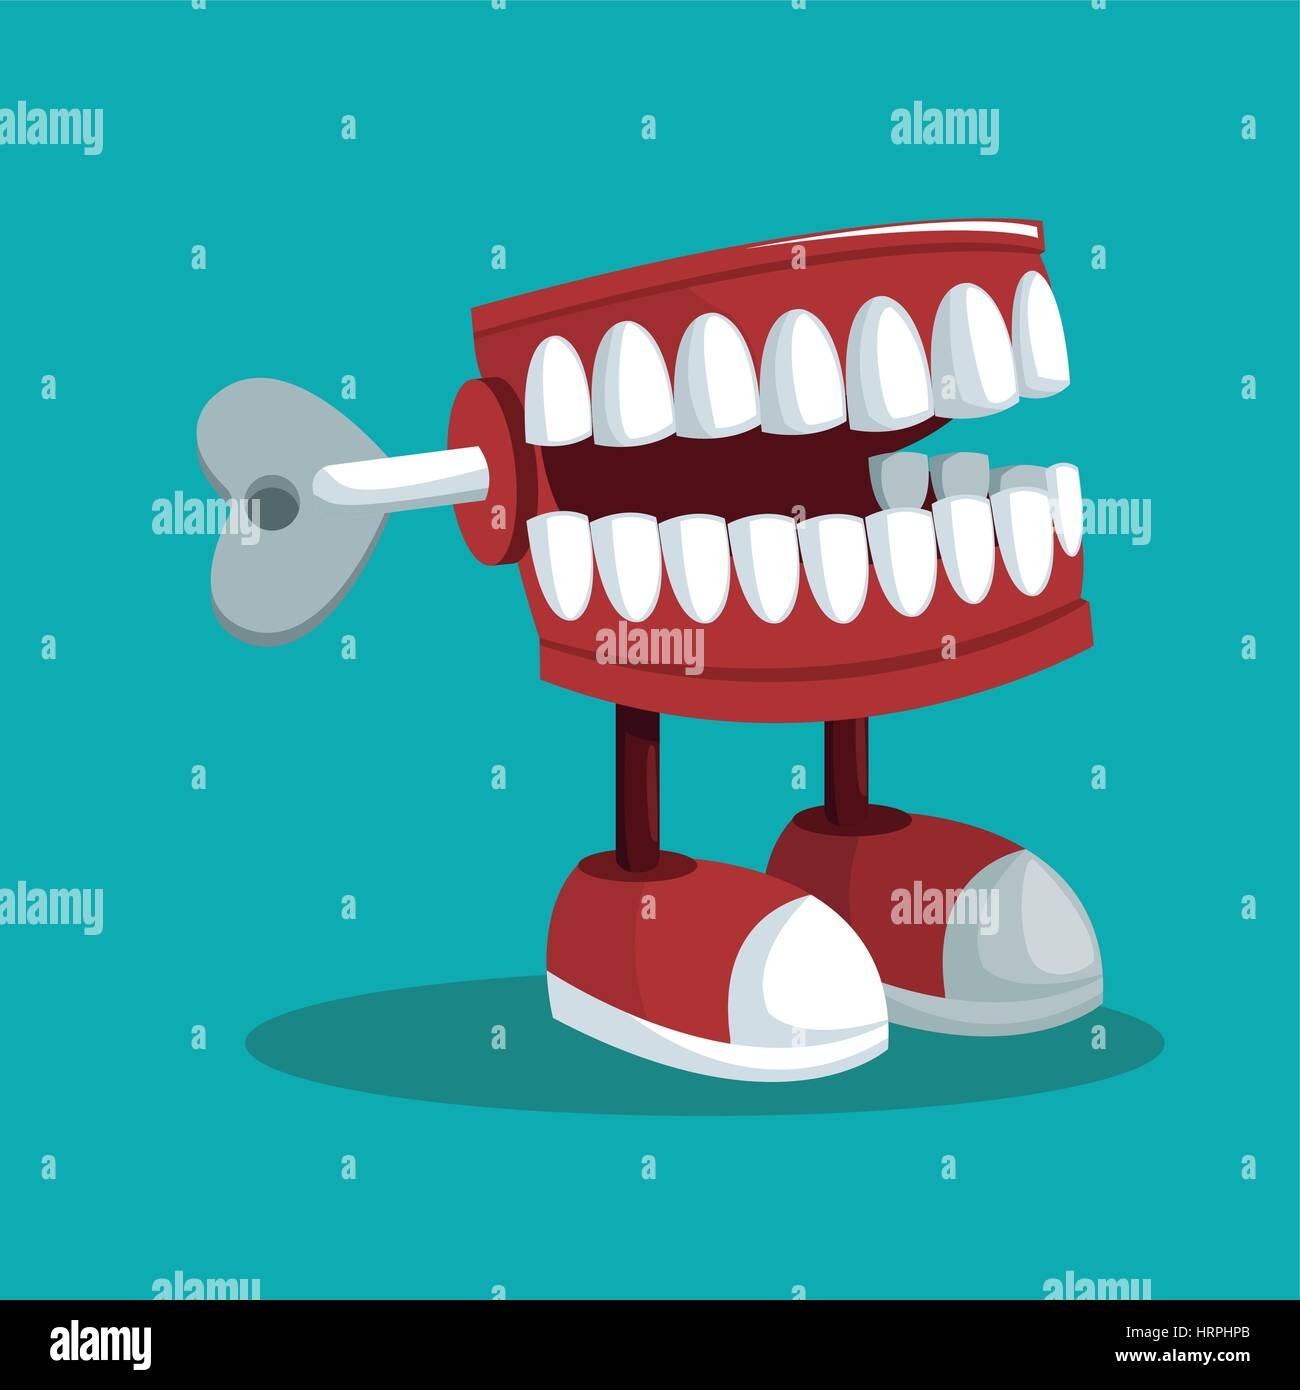 april fools day teeth practical joke - Stock Image